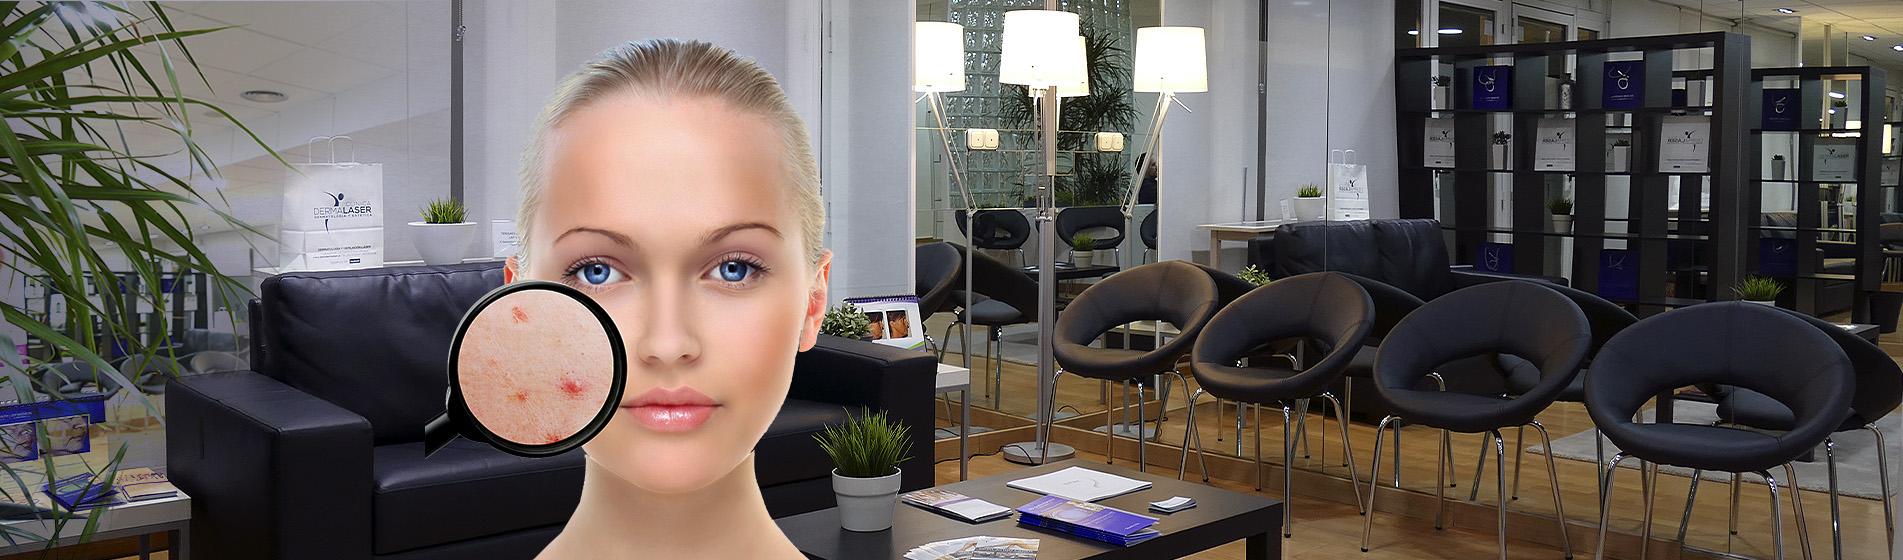 Clinica Dermalaser Dermatologia Estetica Depilacion Laser